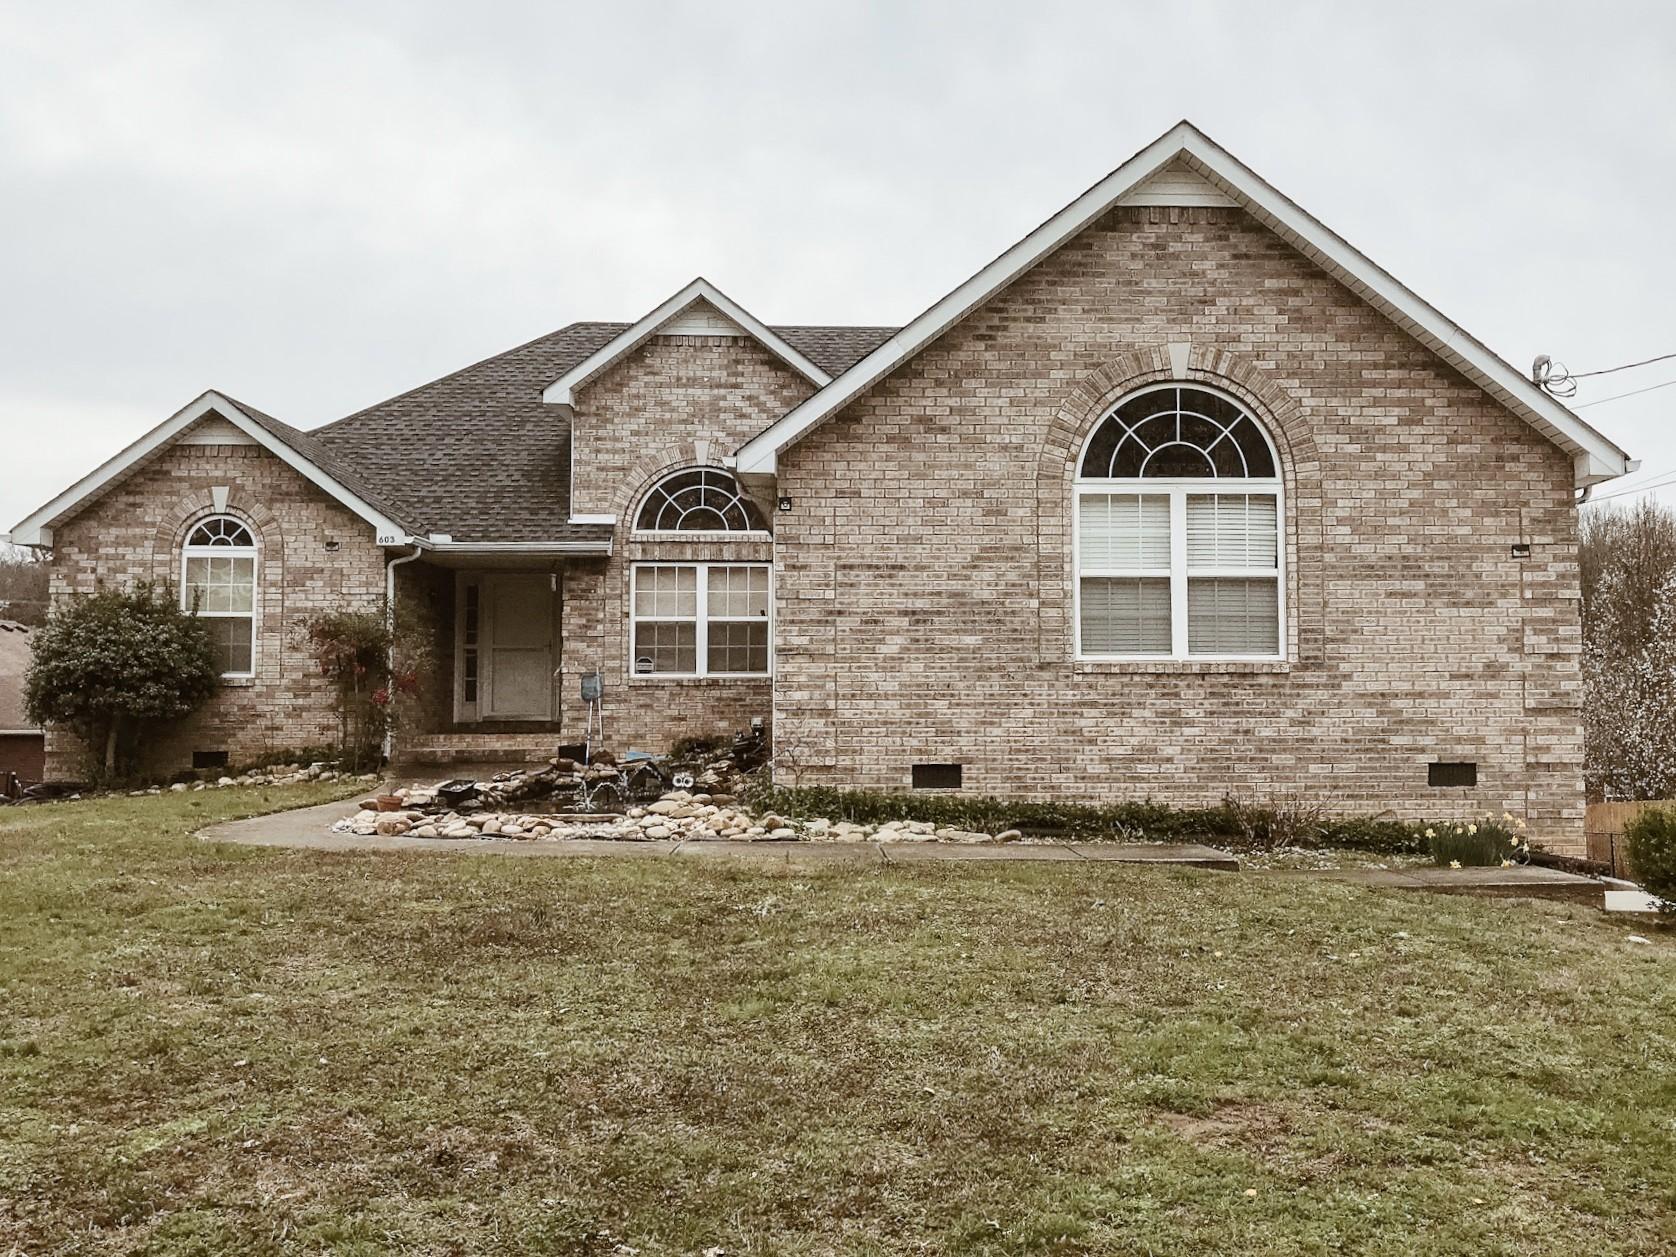 603 Cookstown Dr, Smyrna, TN 37167 - Smyrna, TN real estate listing